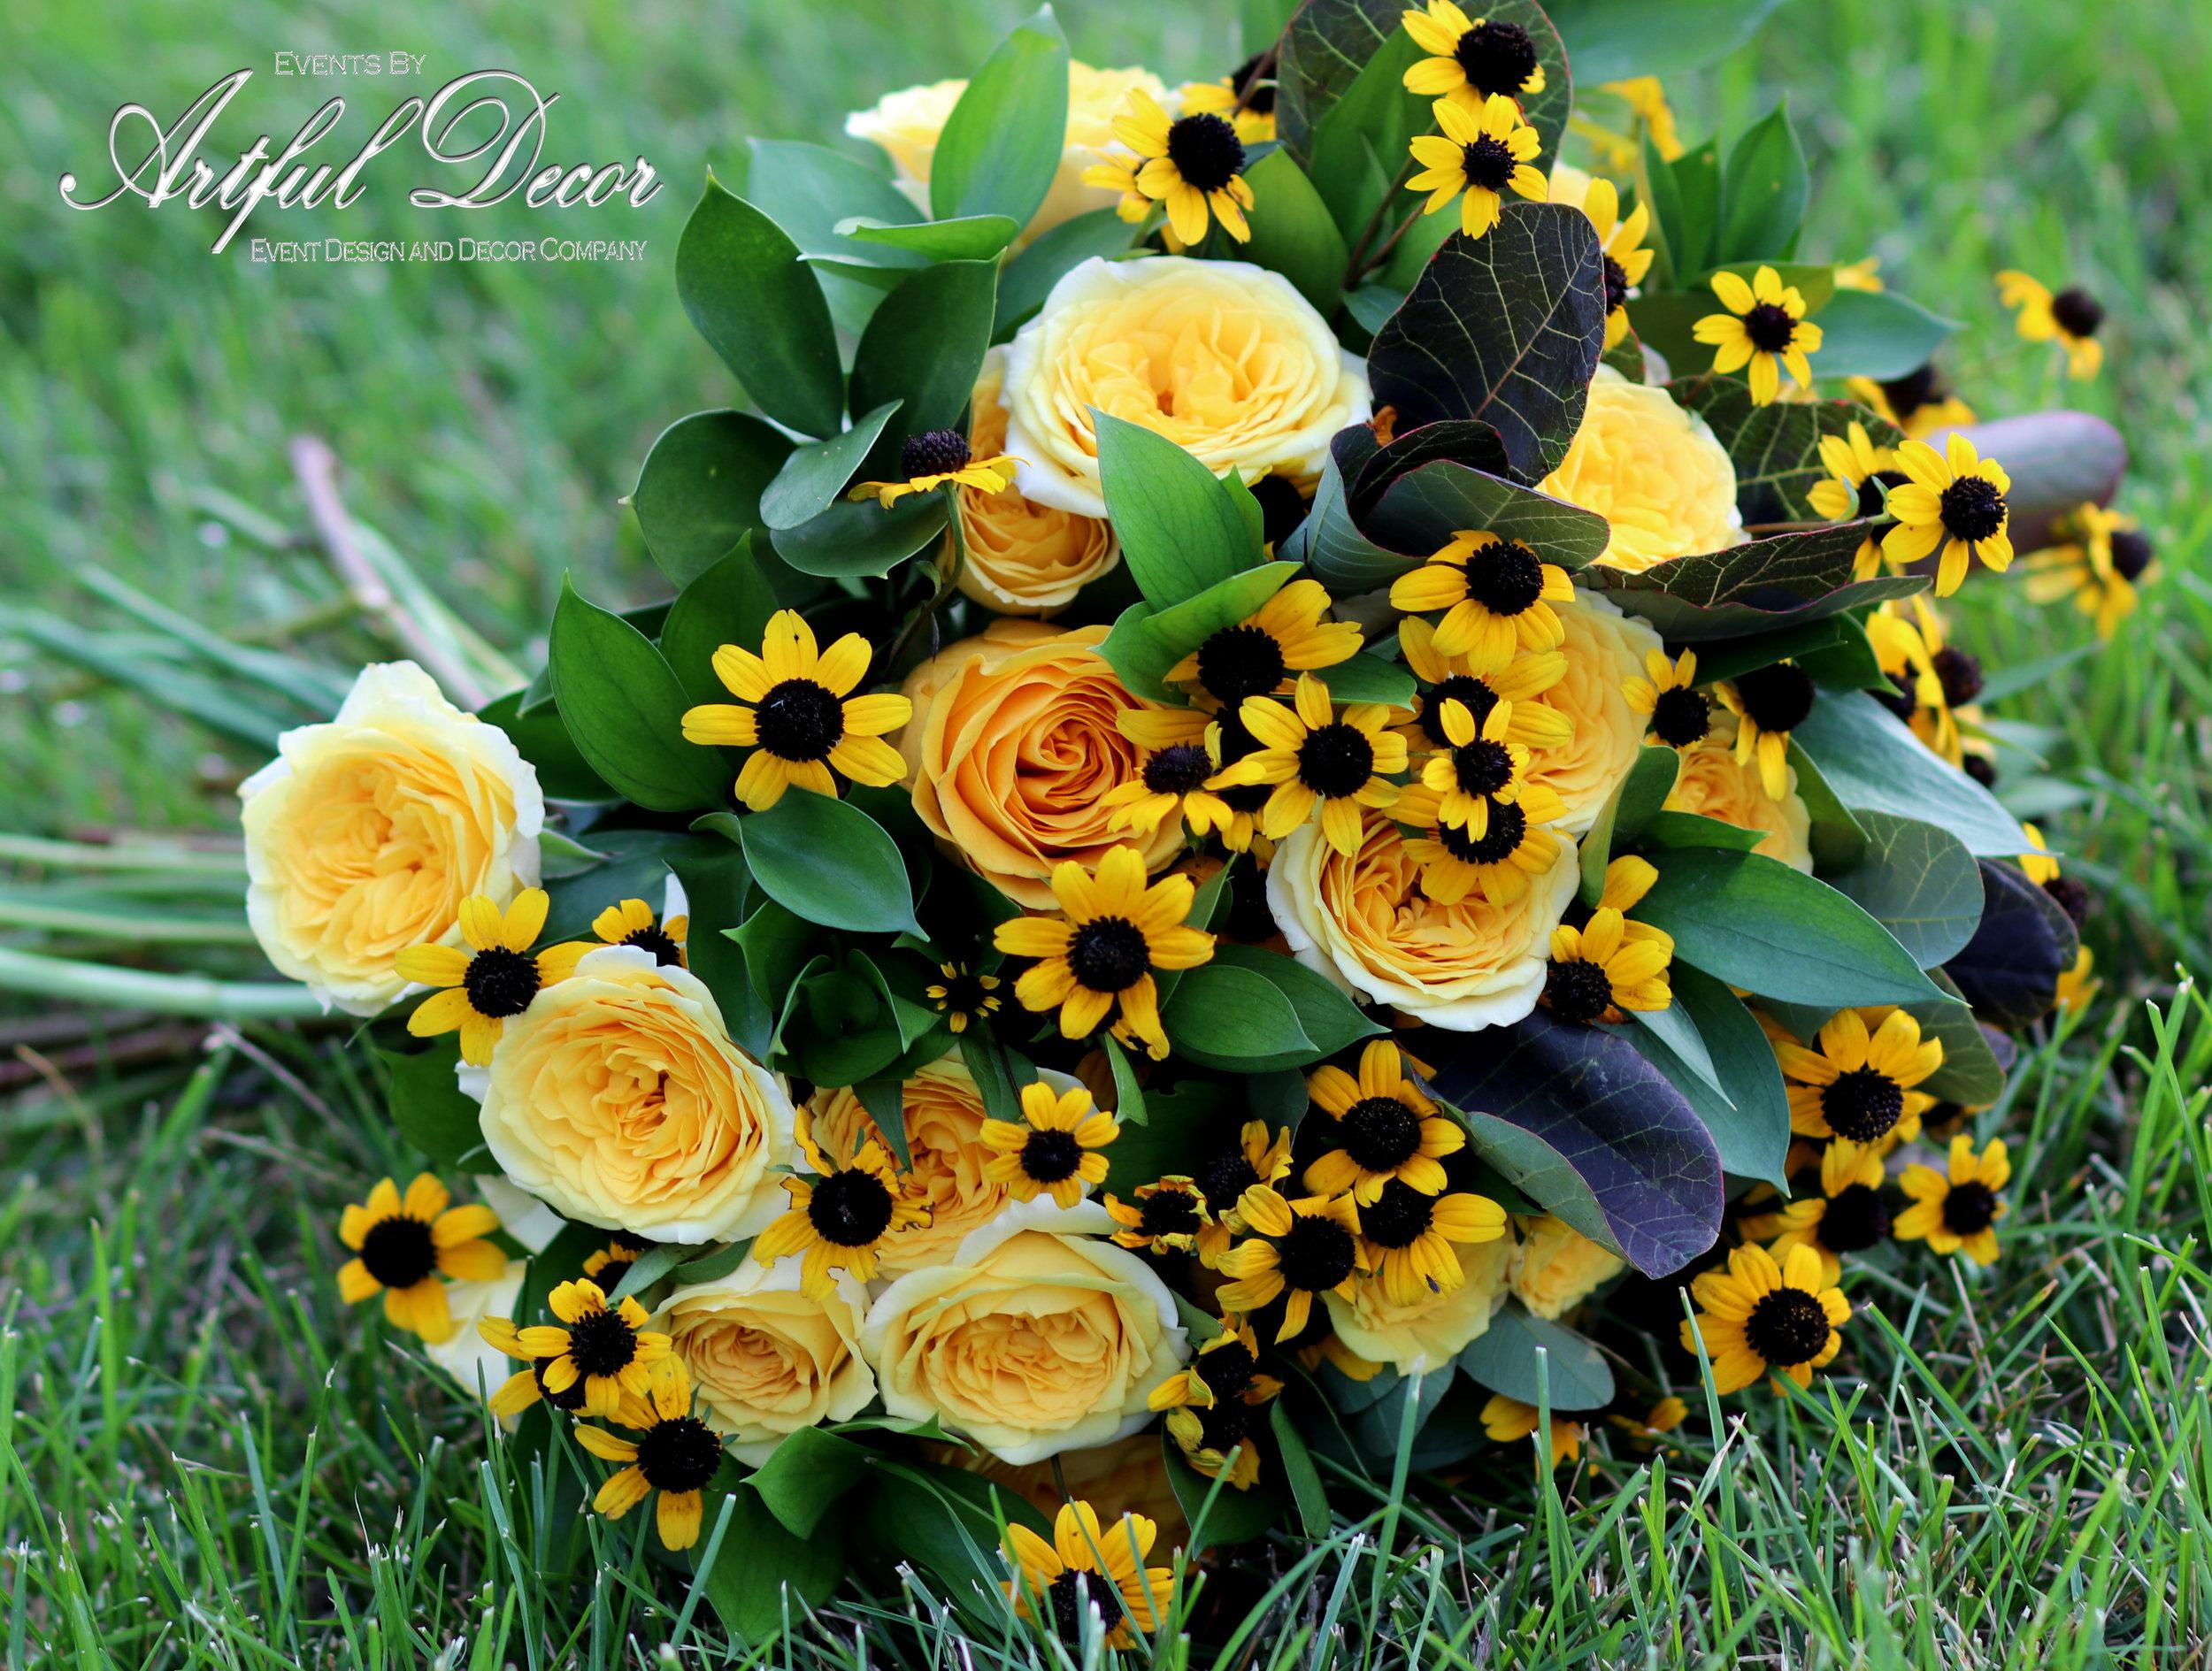 Bouquet 5 Full Copyright.jpg